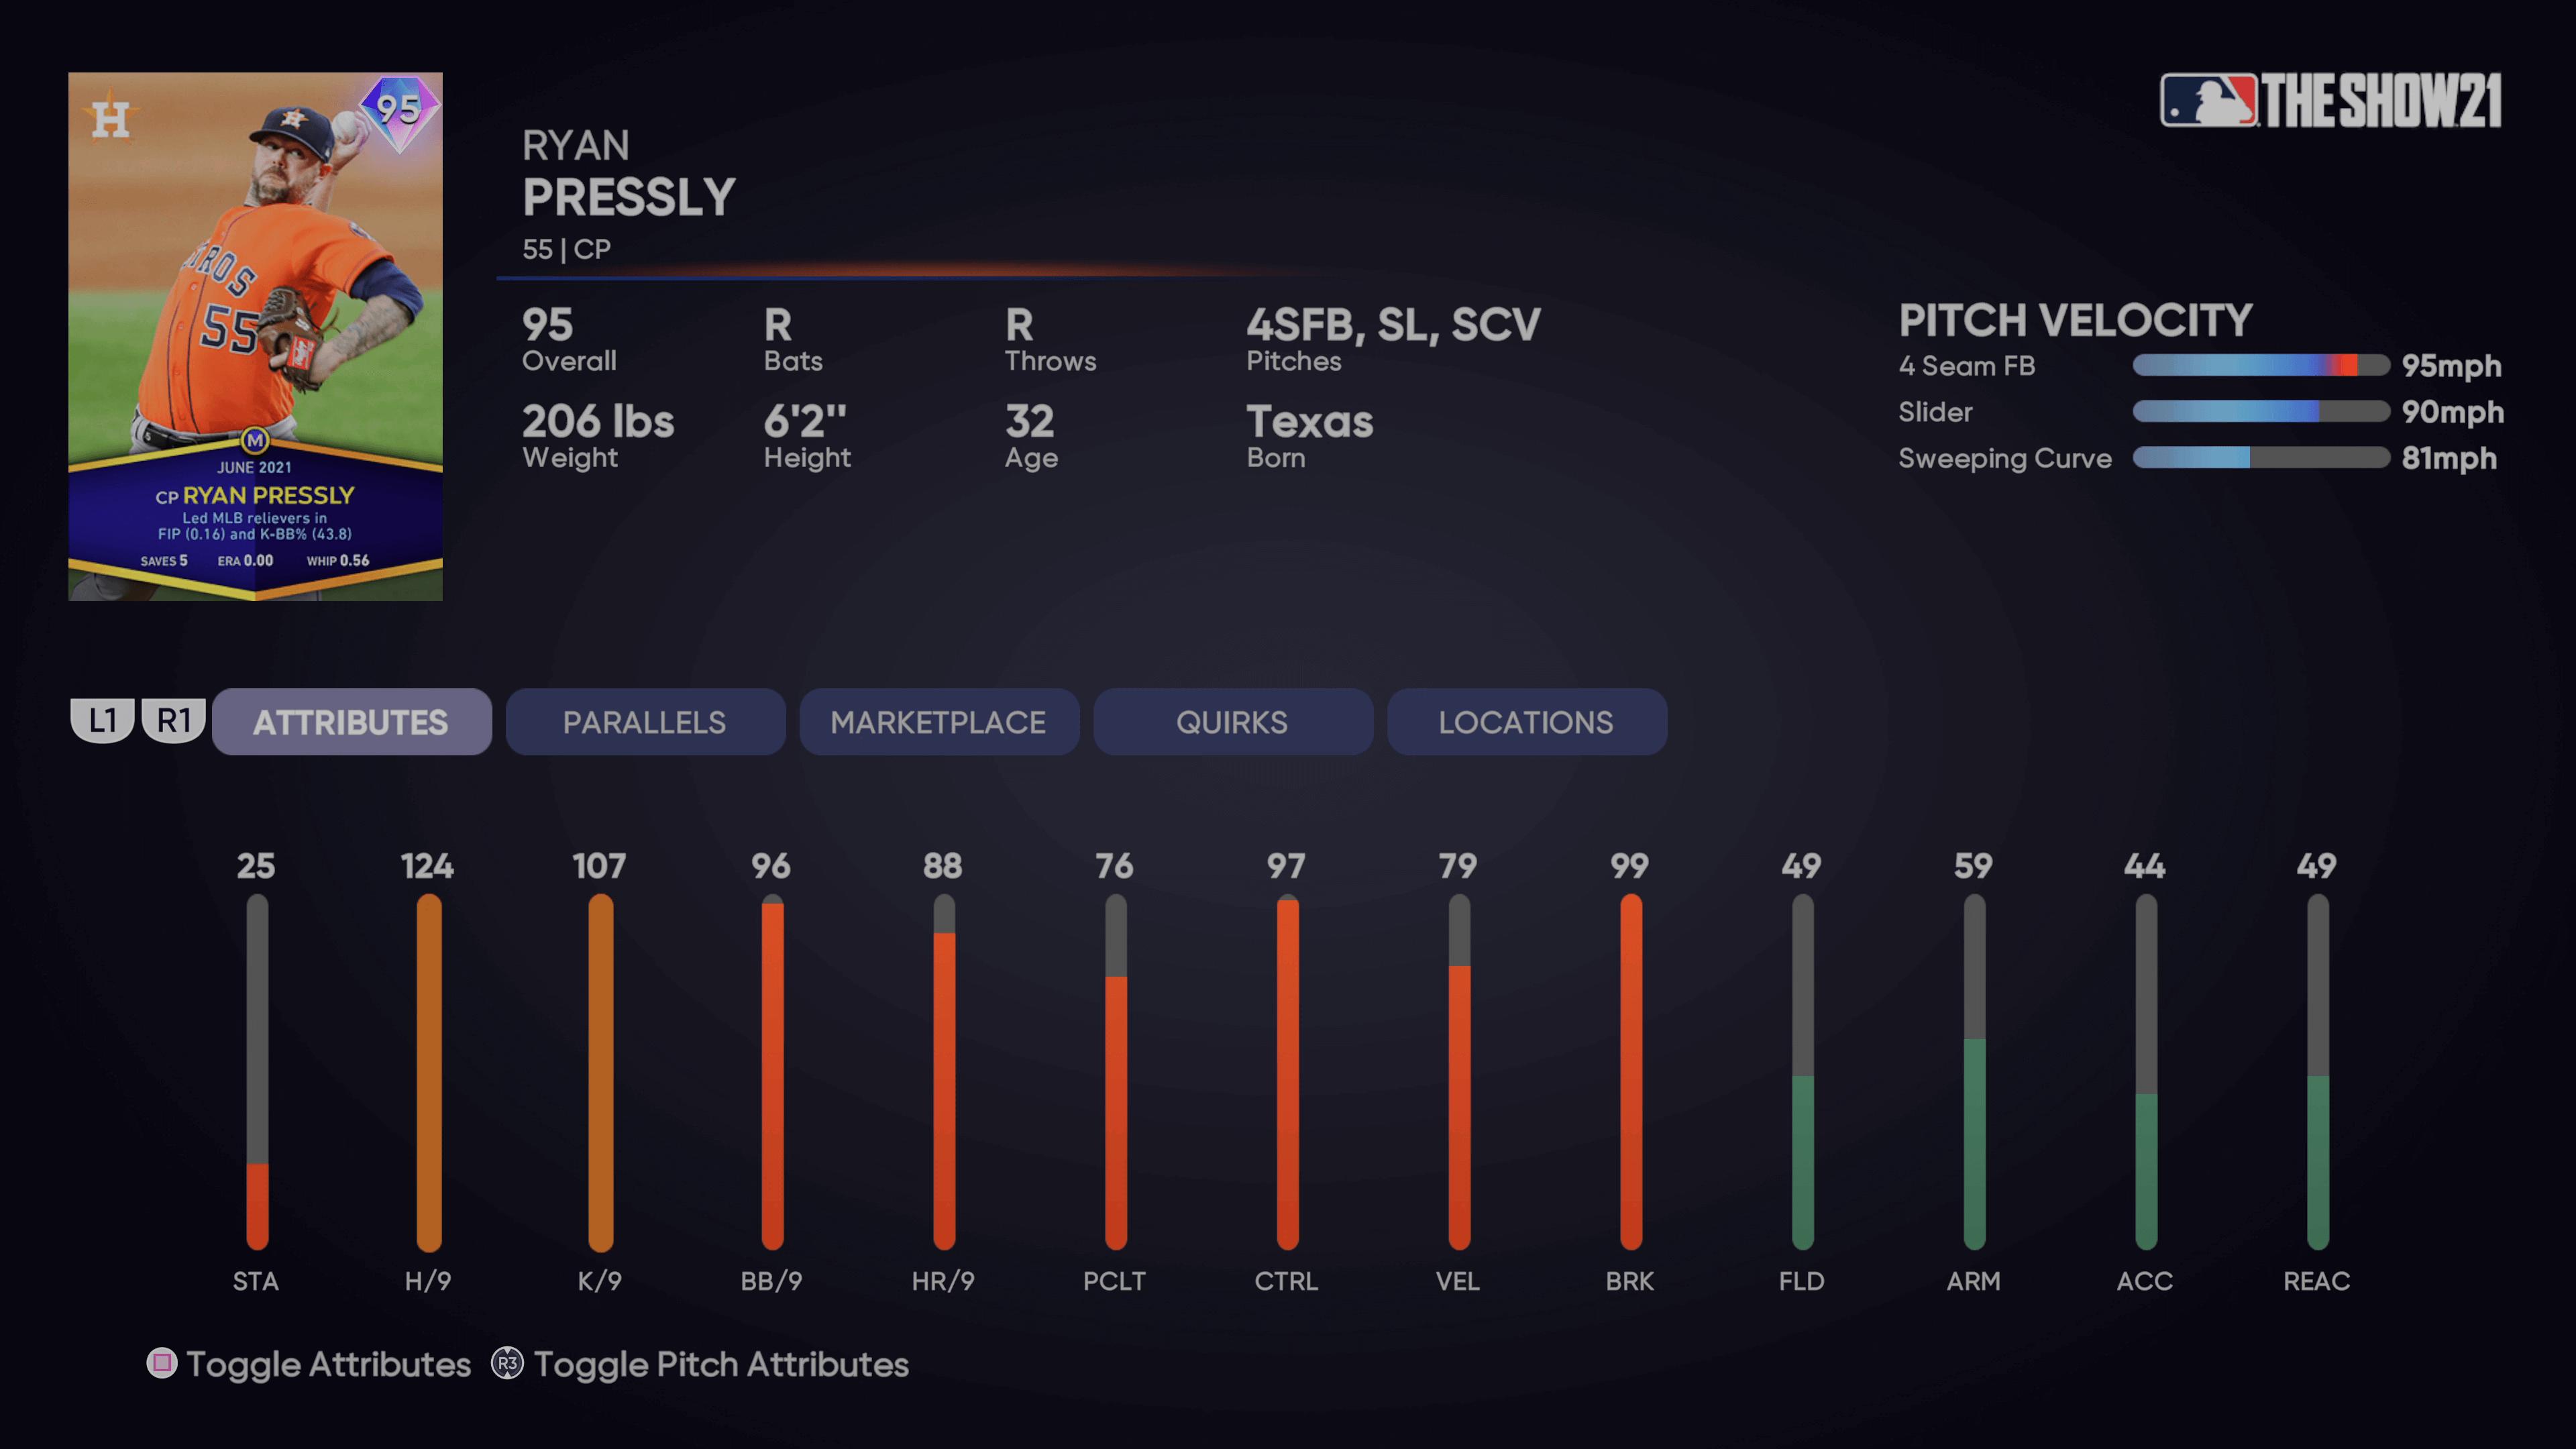 MLB The Show 21 - June Monthly Awards Program_2021-07-07_18-09-32